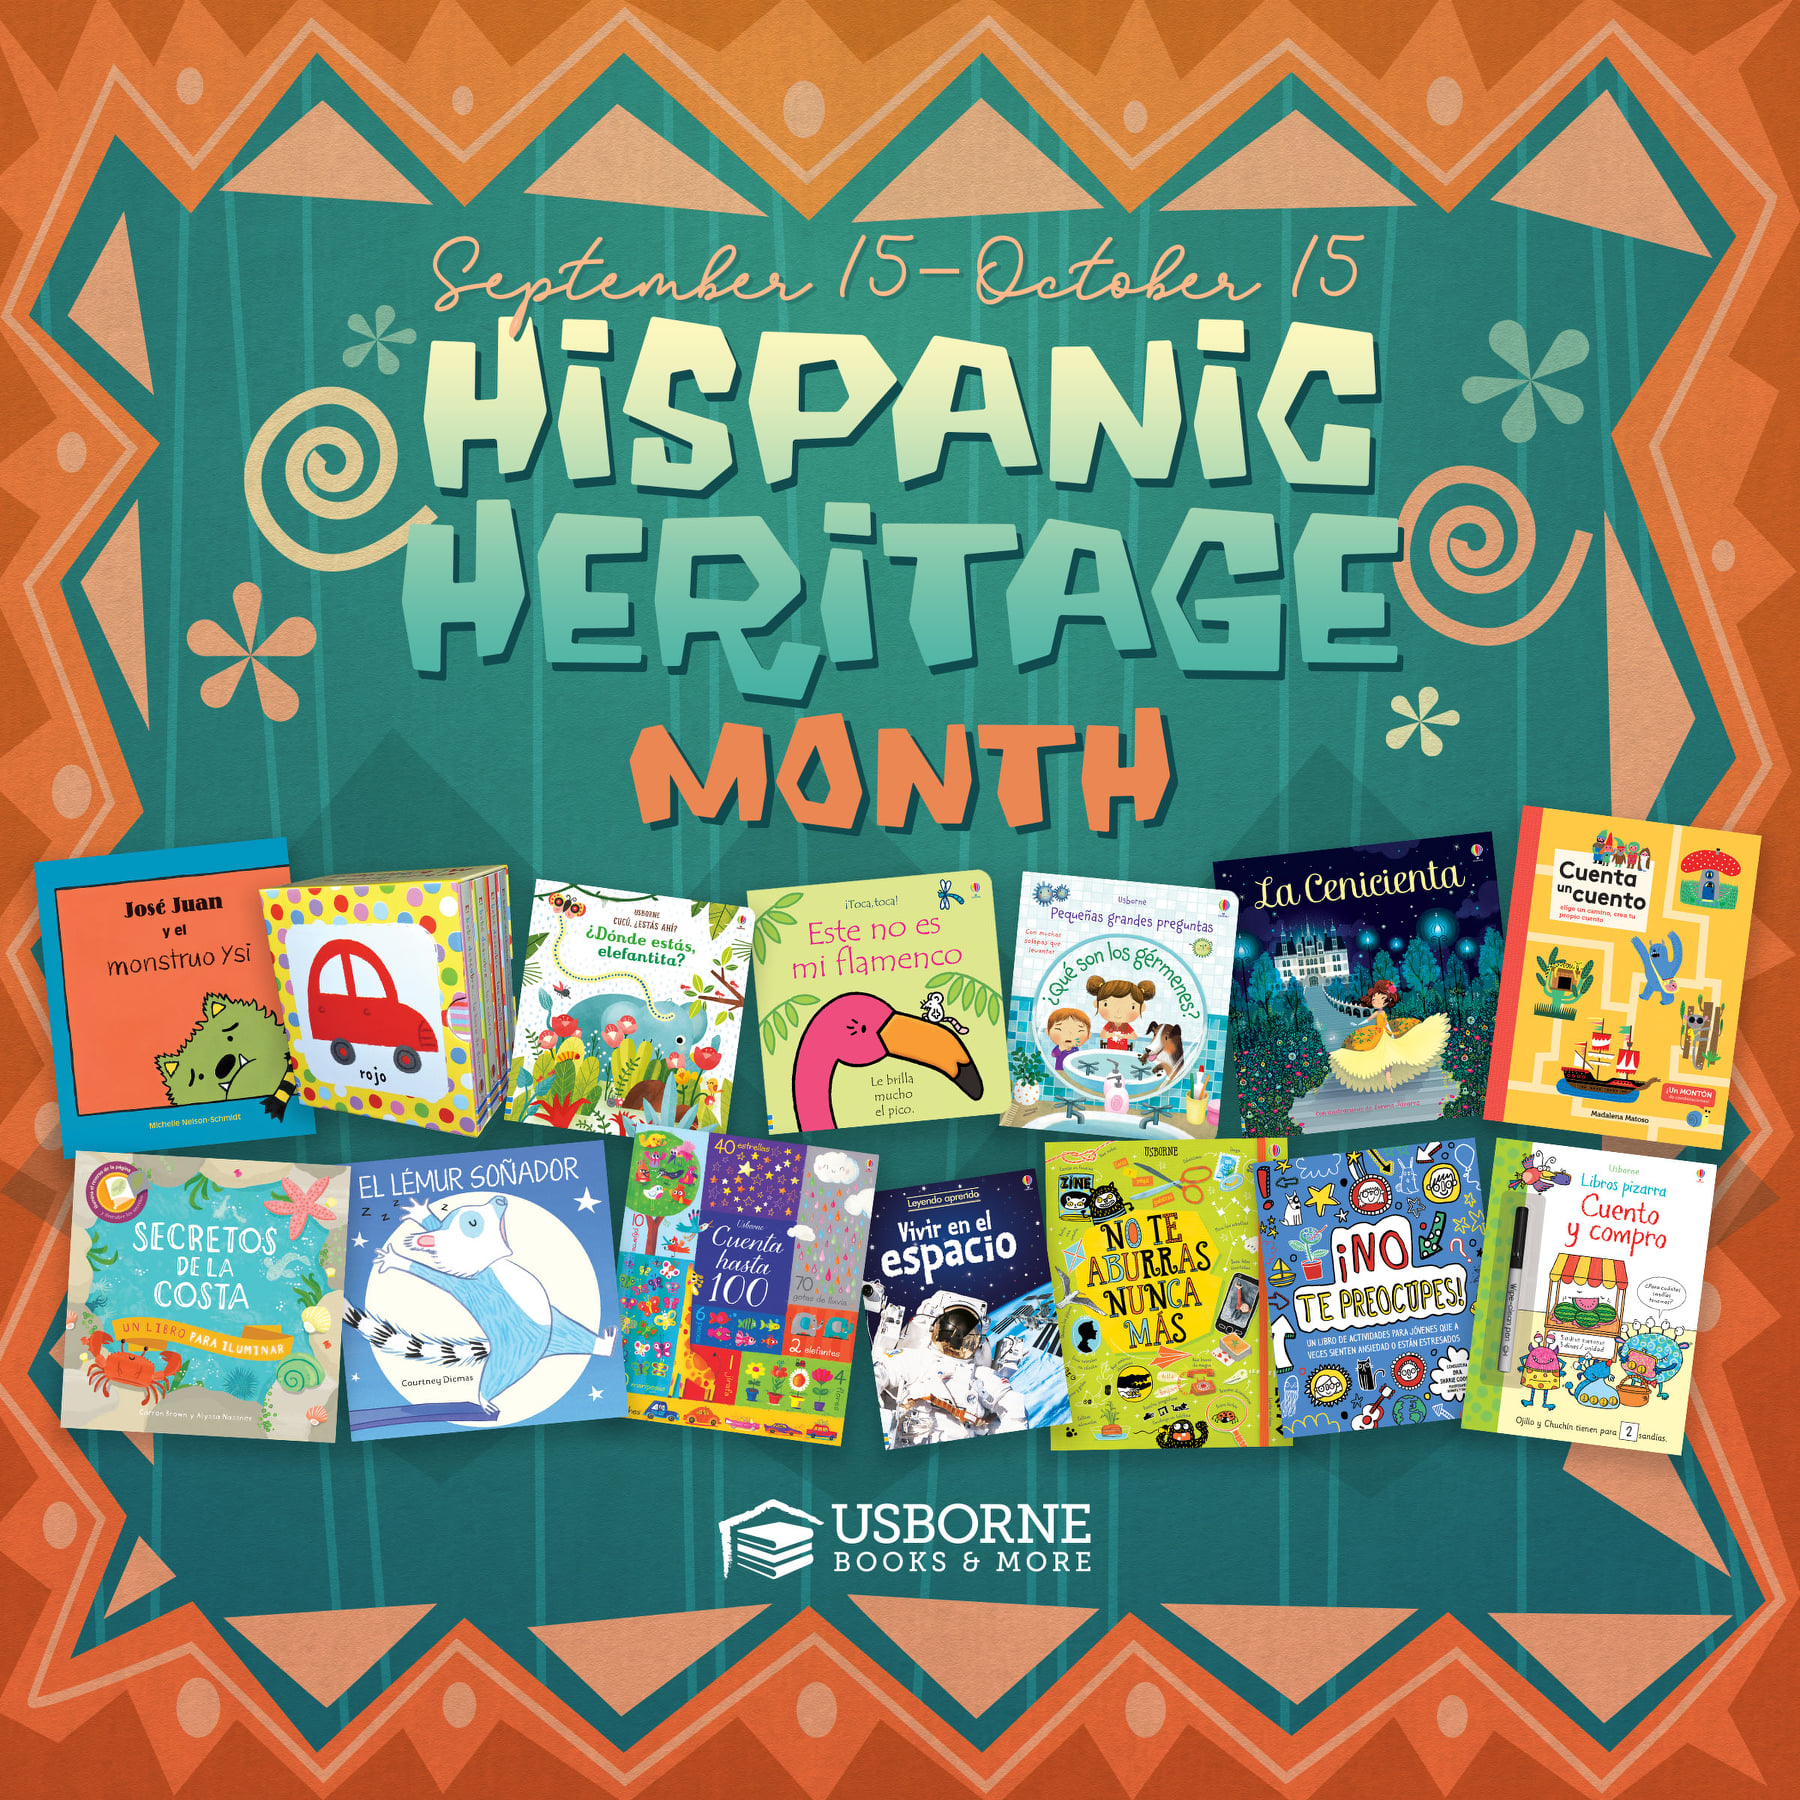 National Hispanic Heritage Month ~ September 15 - October 15